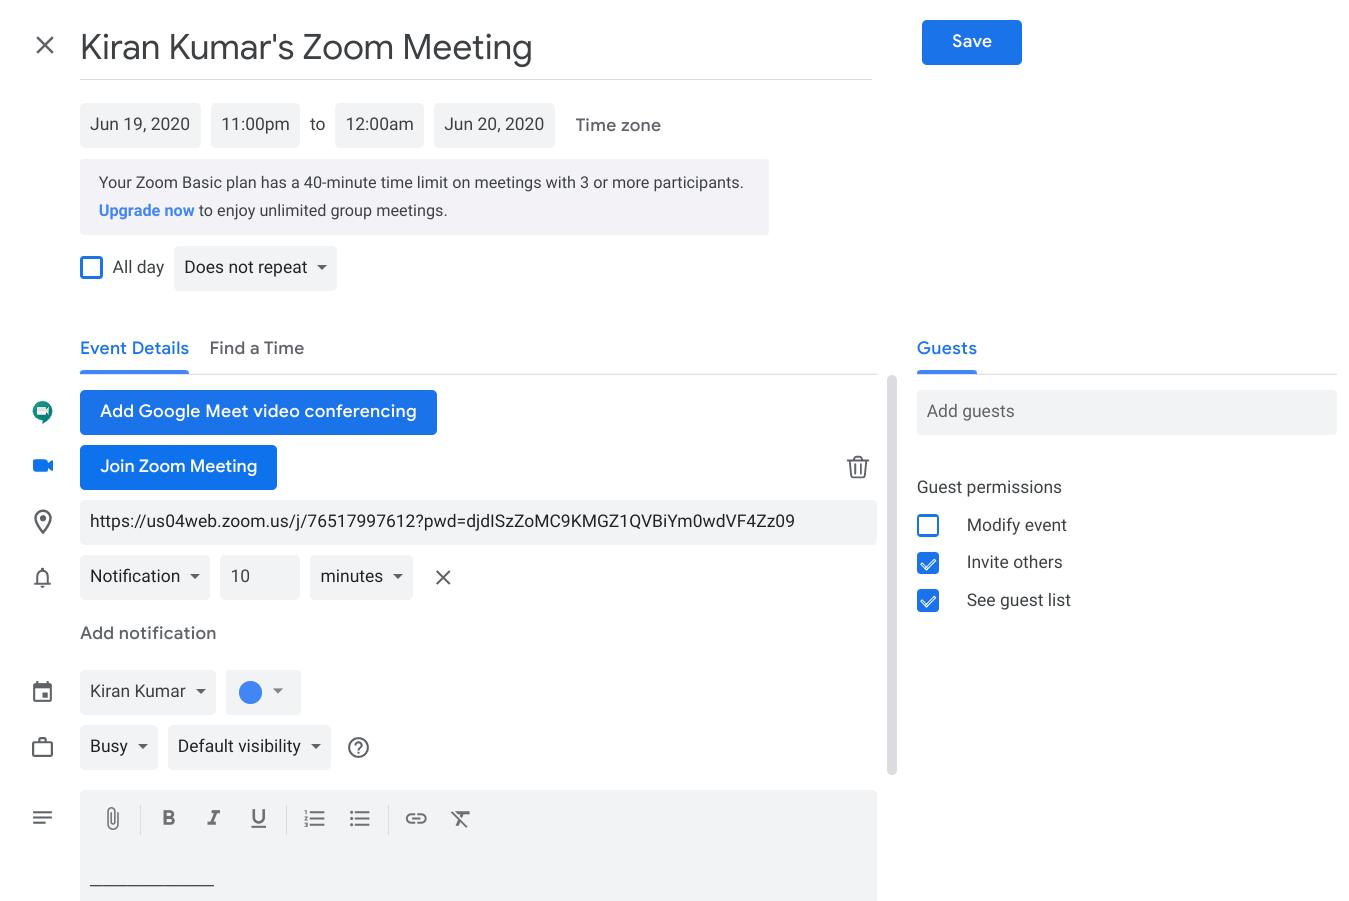 Schedule a Zoom Meeting